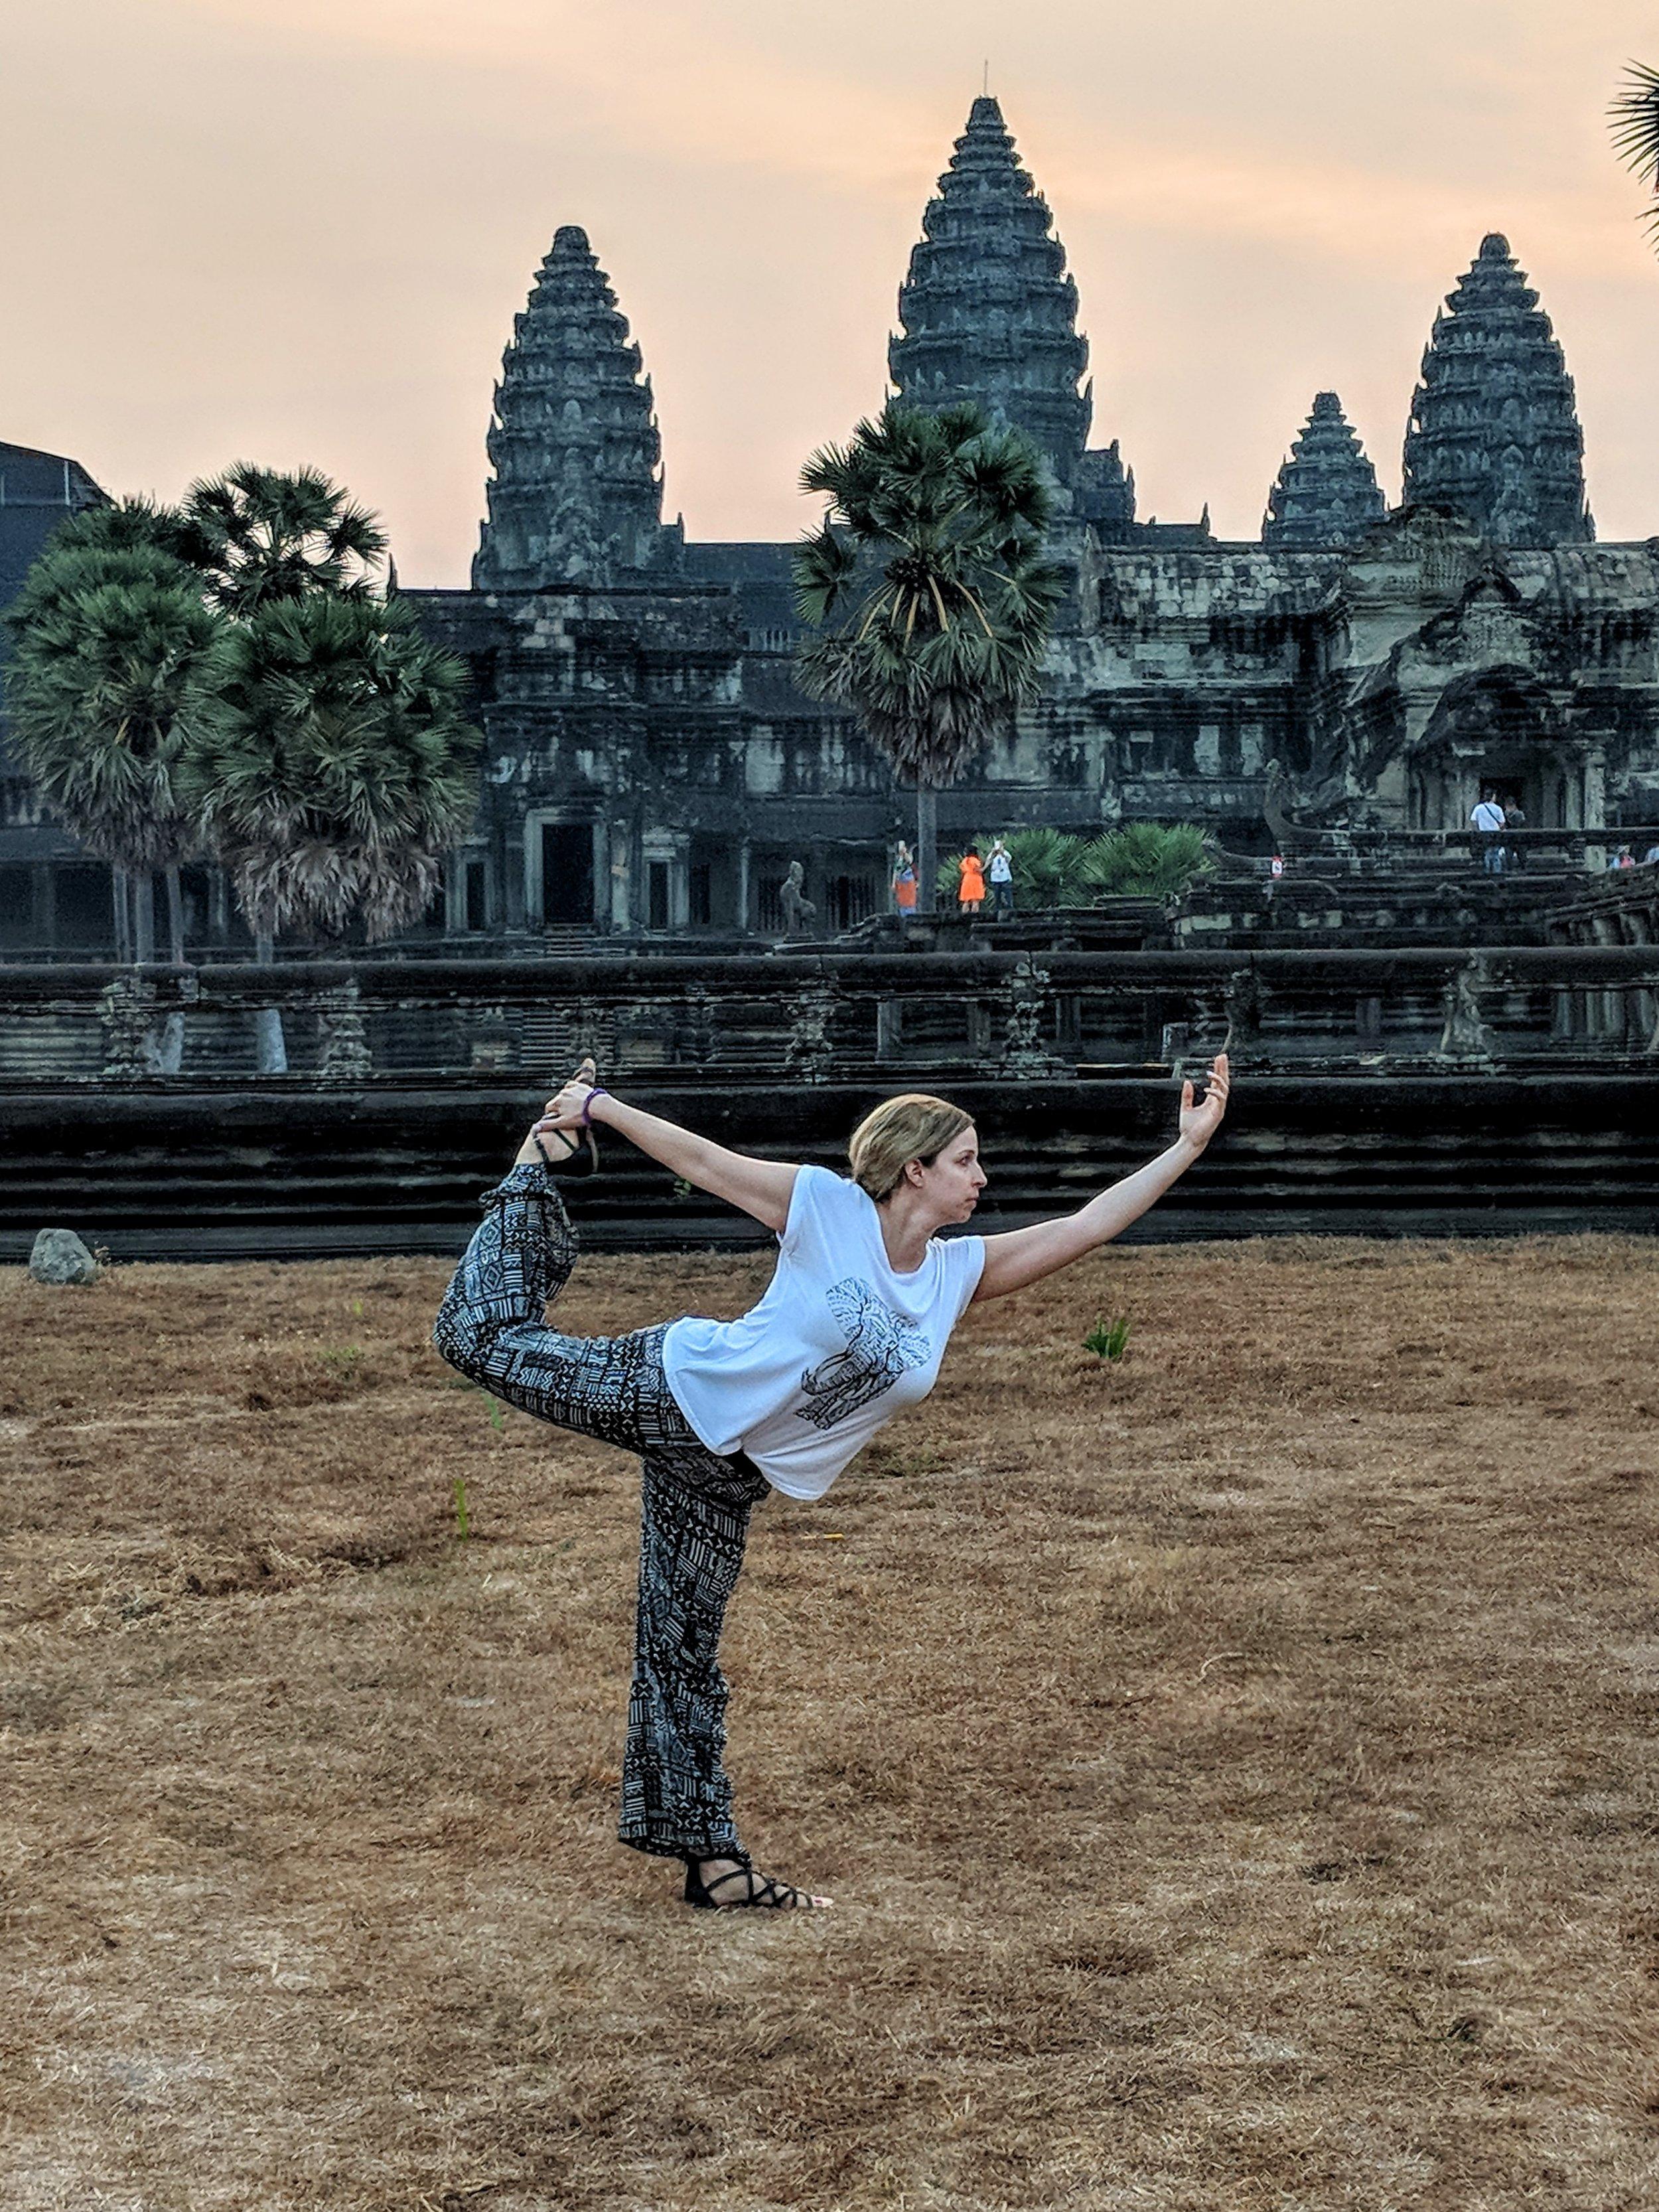 Retreat scouting at Angkor Wat in Cambodia